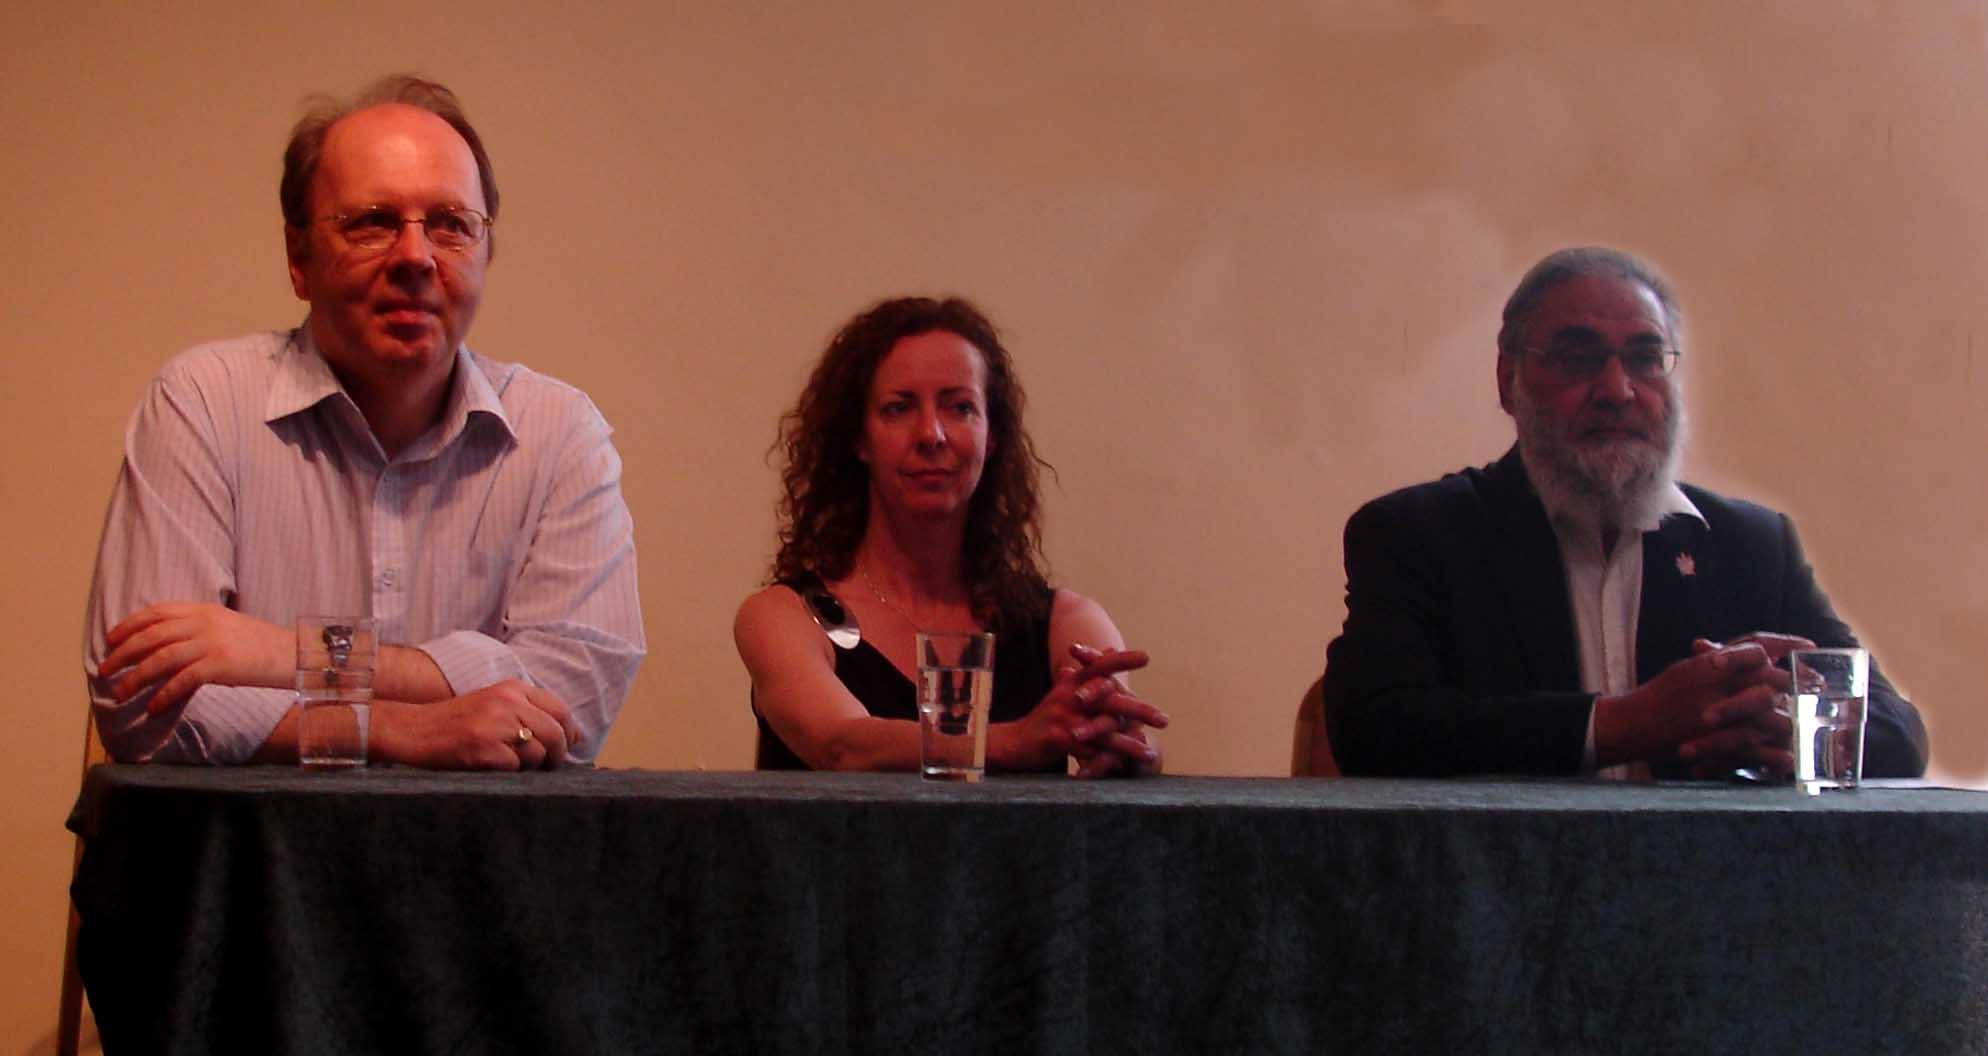 Nigel Barrett, Susan Beresford and Cllr Faizullah Khan